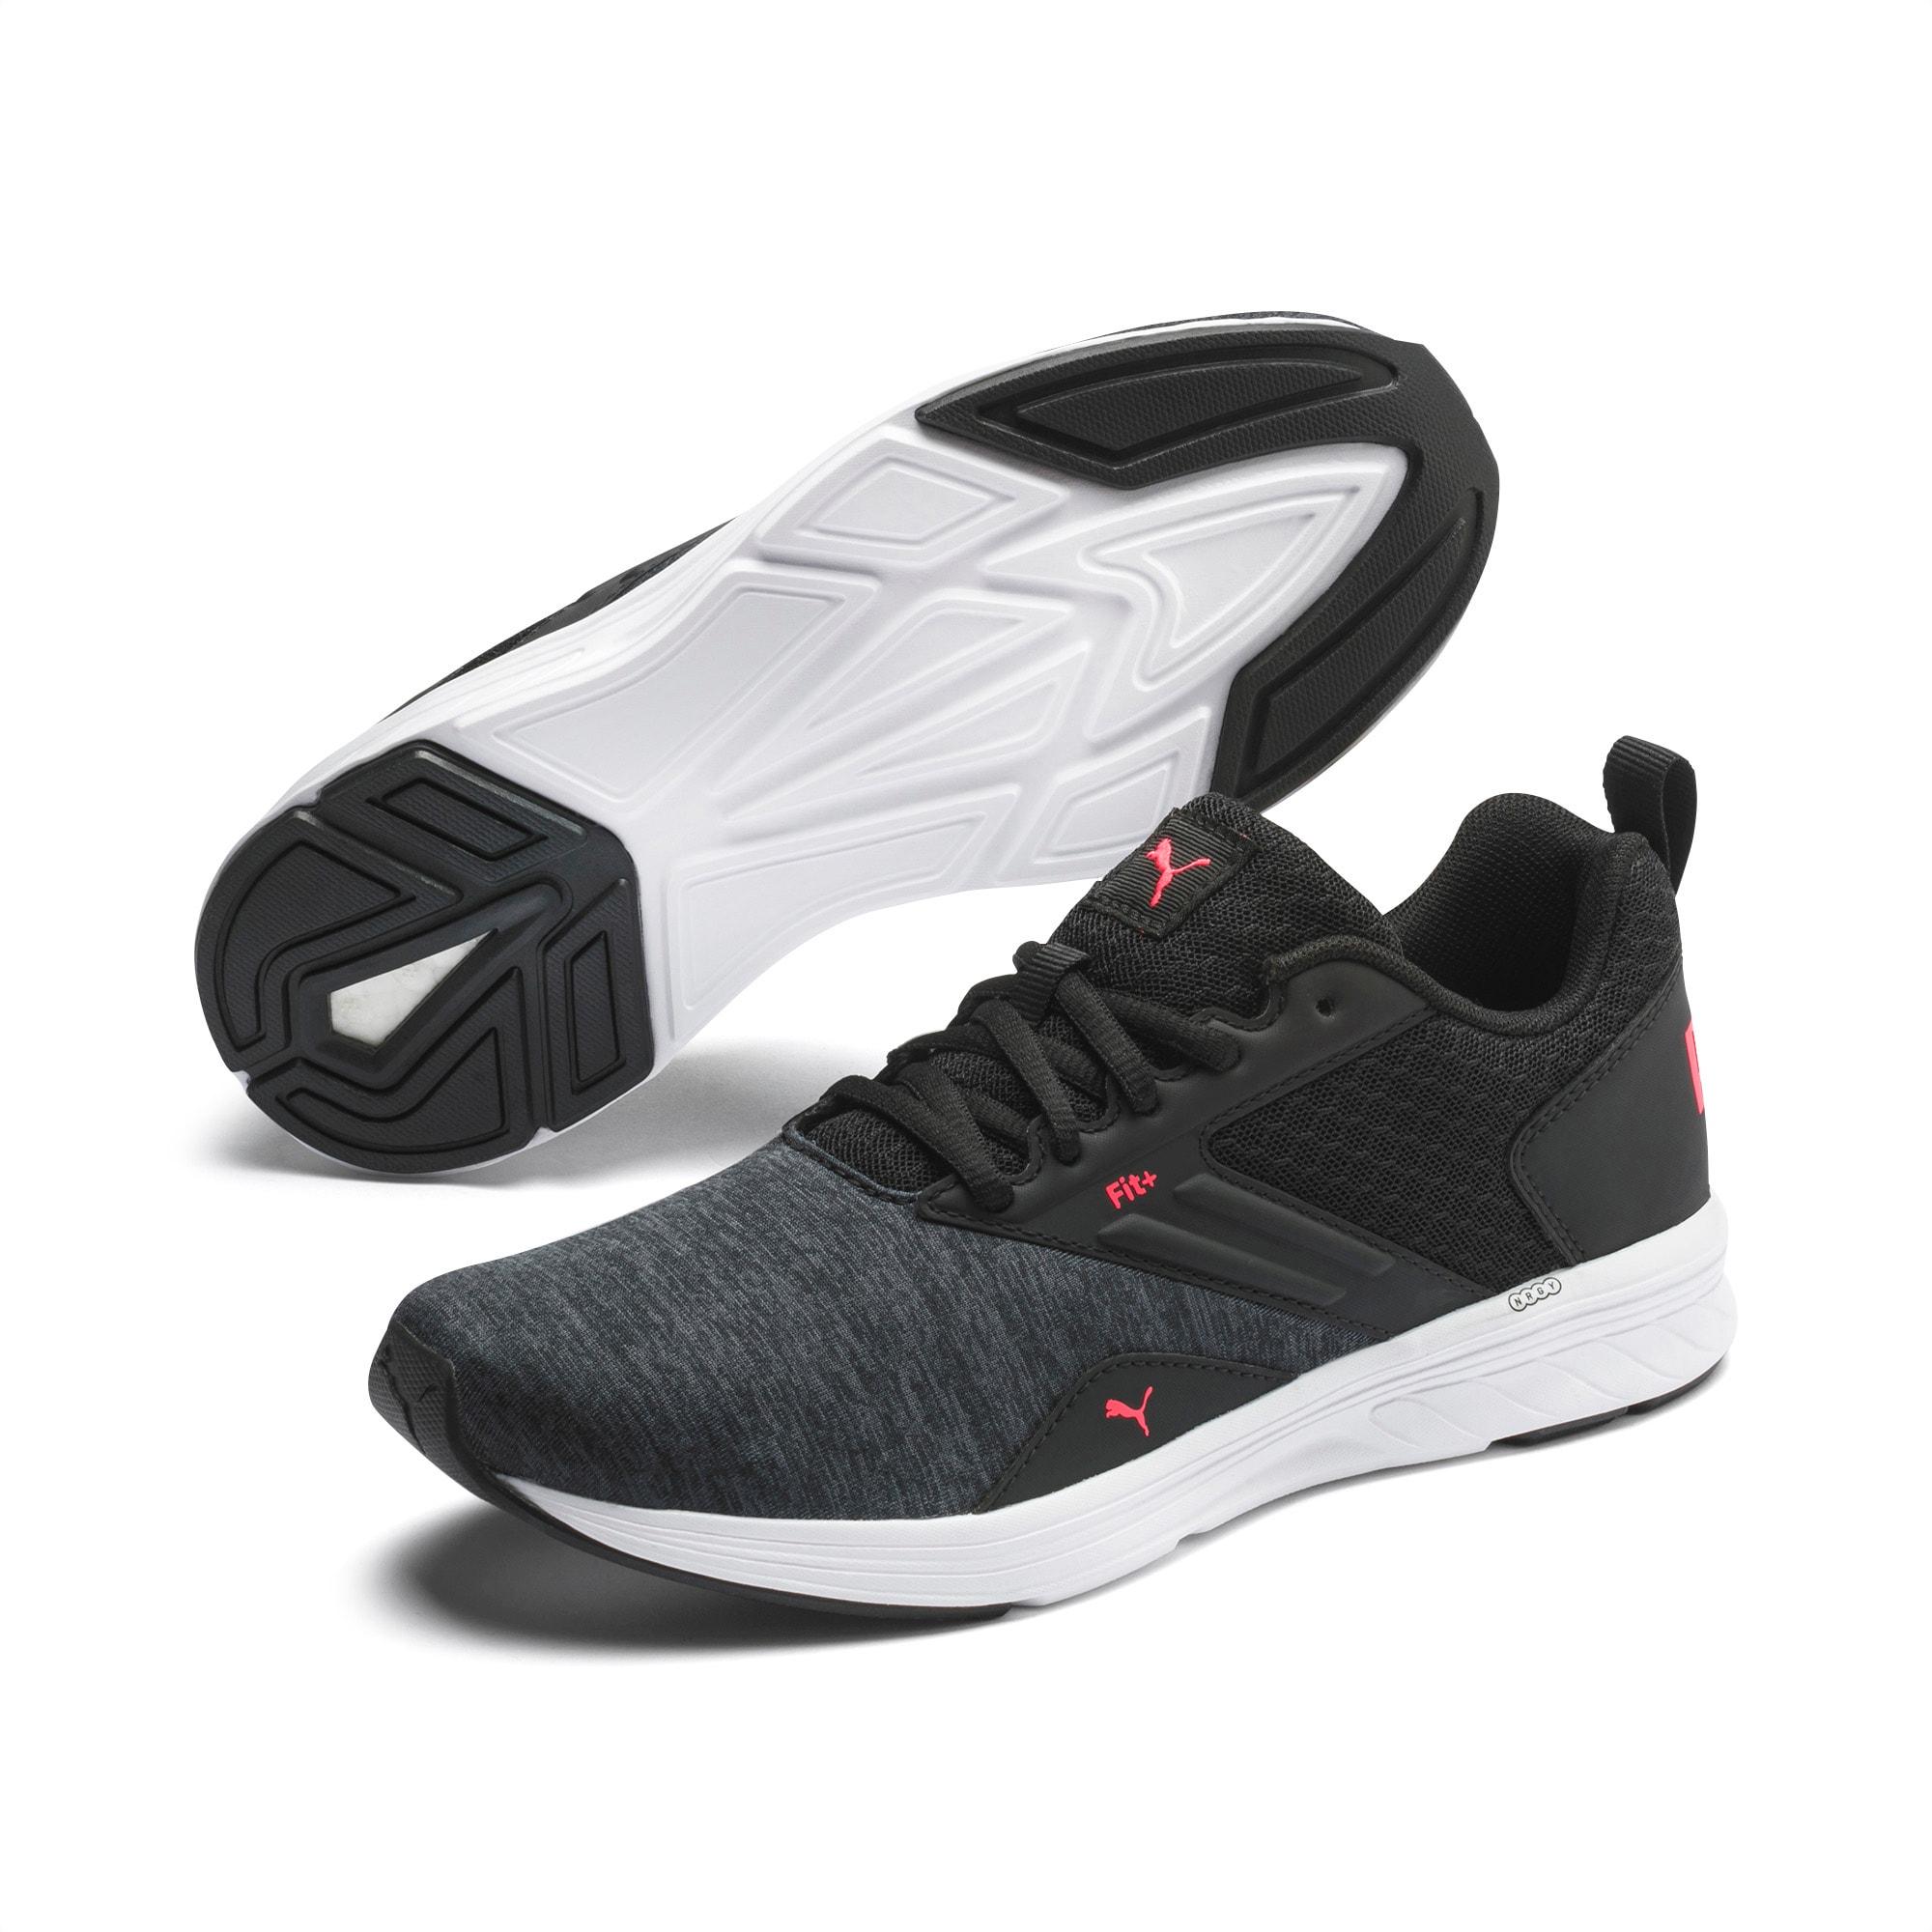 NRGY Comet Men's Running Shoes   PUMA US